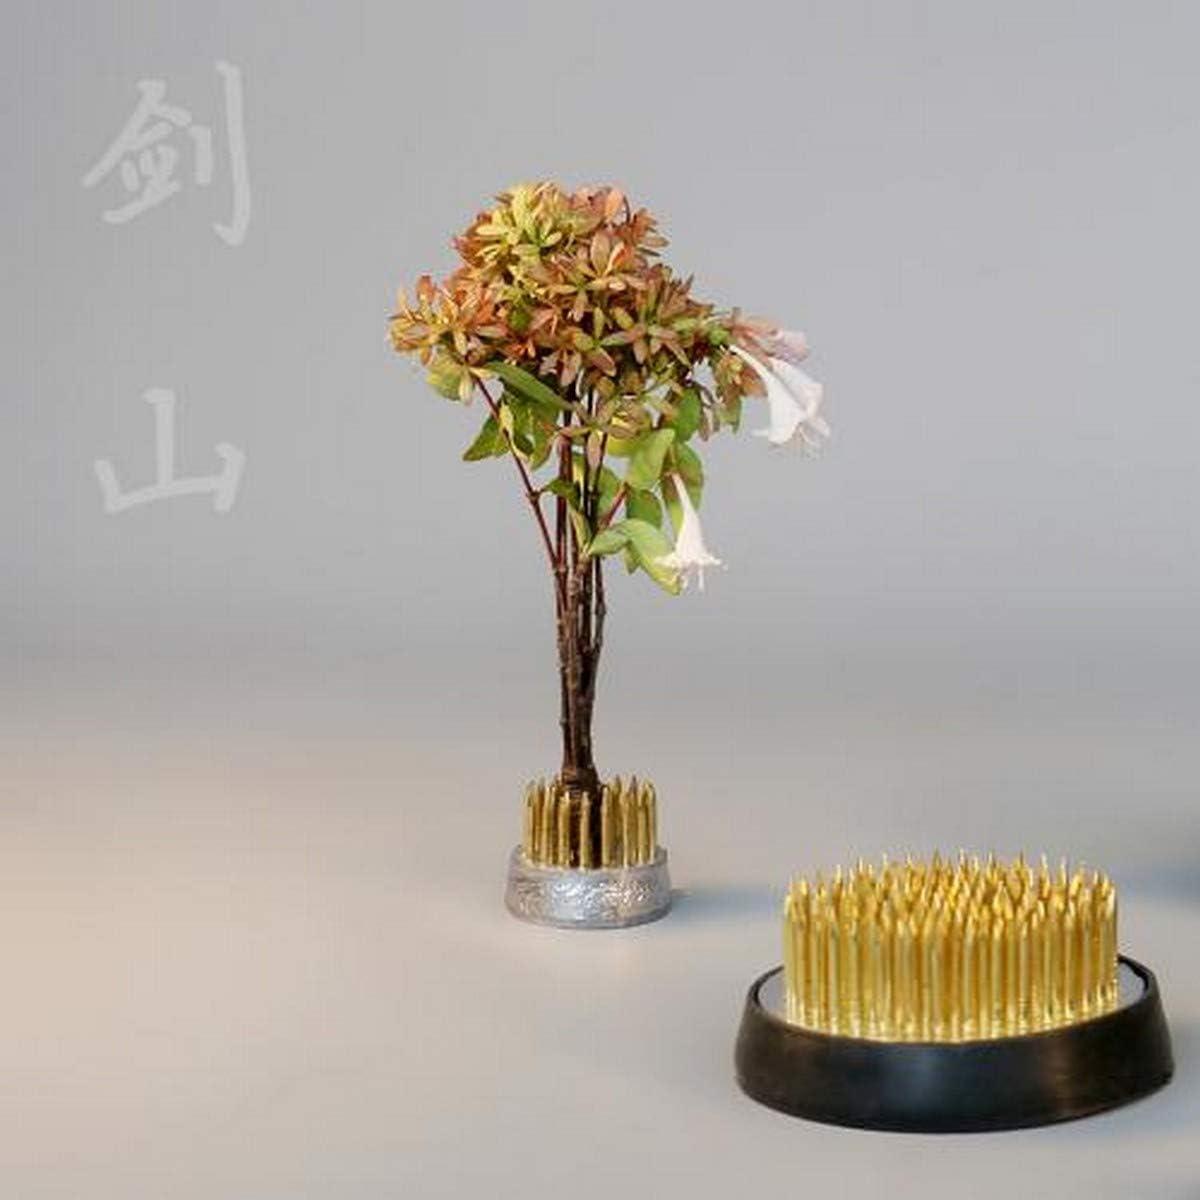 EXCEART 6Pcs Flower Frog Round Holder Japanese Ikebana Kenzan Flower Frog for Flower Arrangement Plant Decoration Plant Fixation